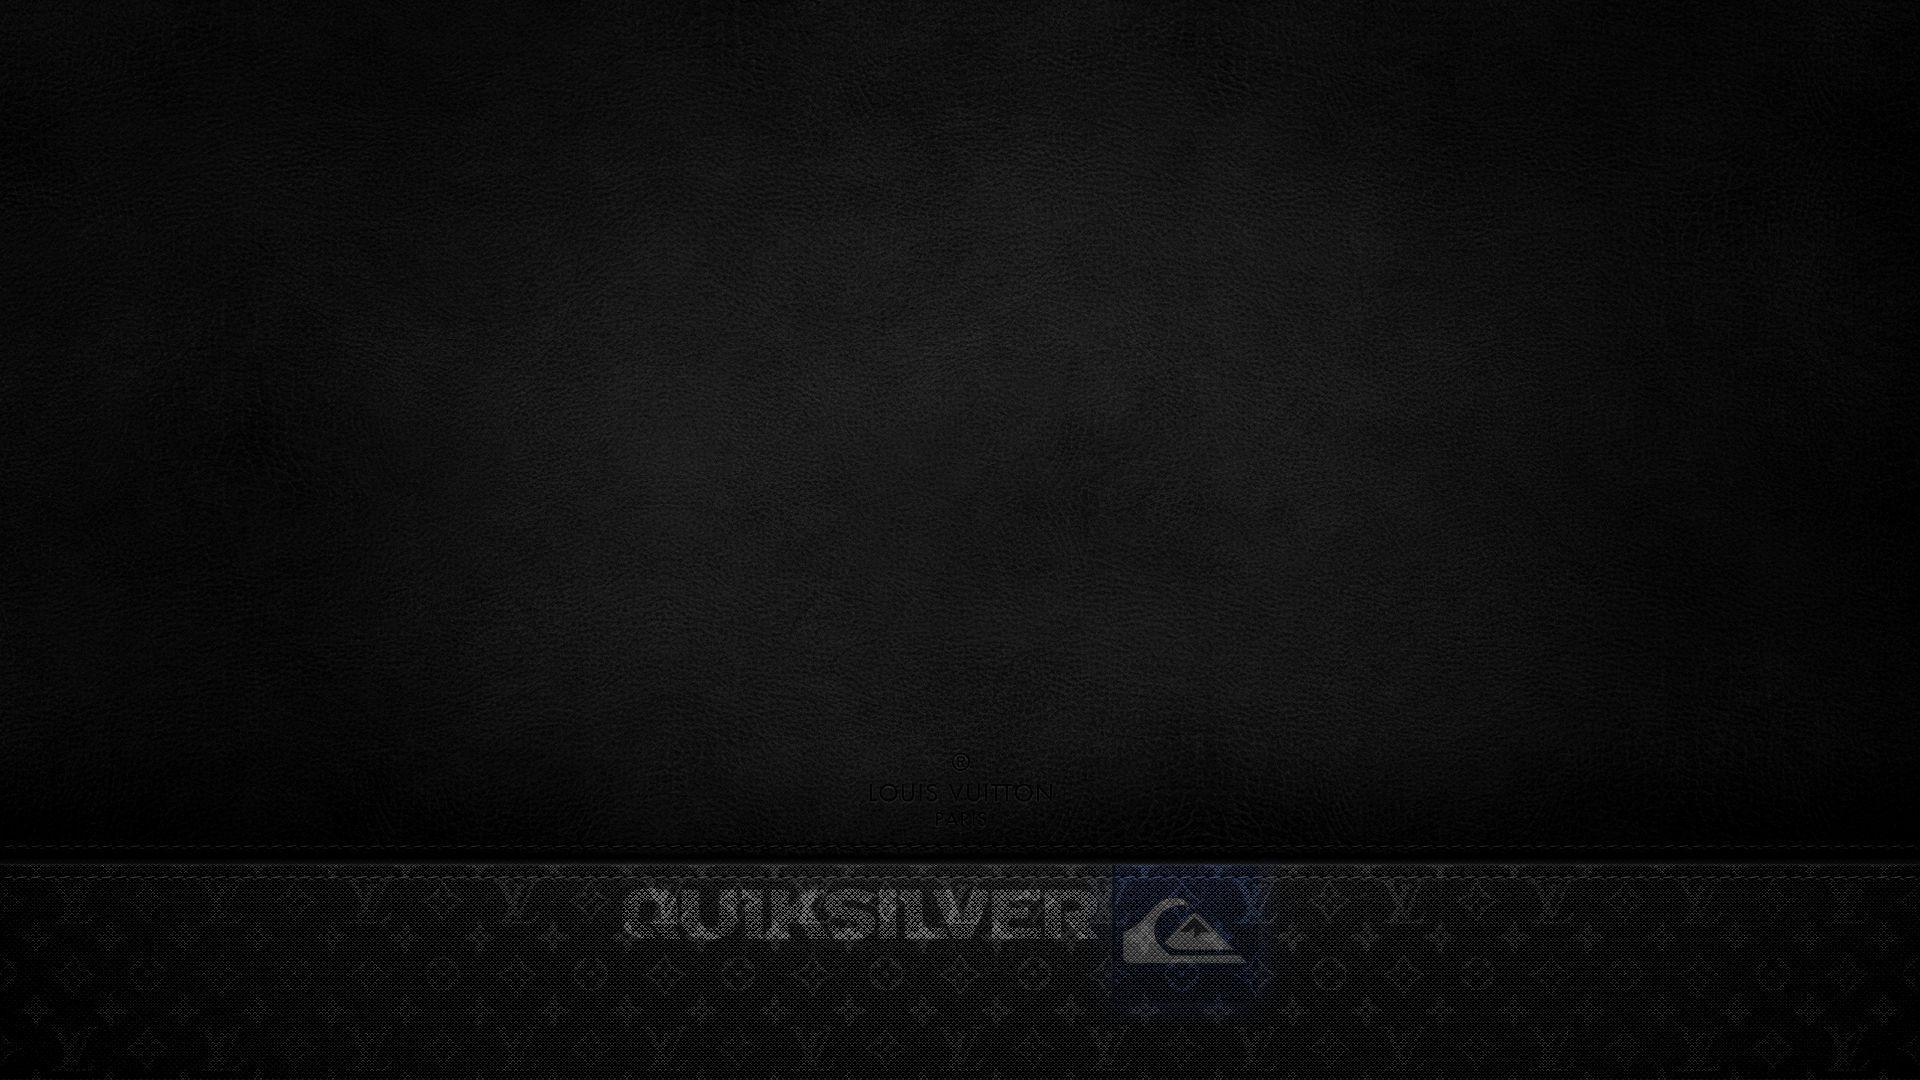 quiksilver wallpaper HD